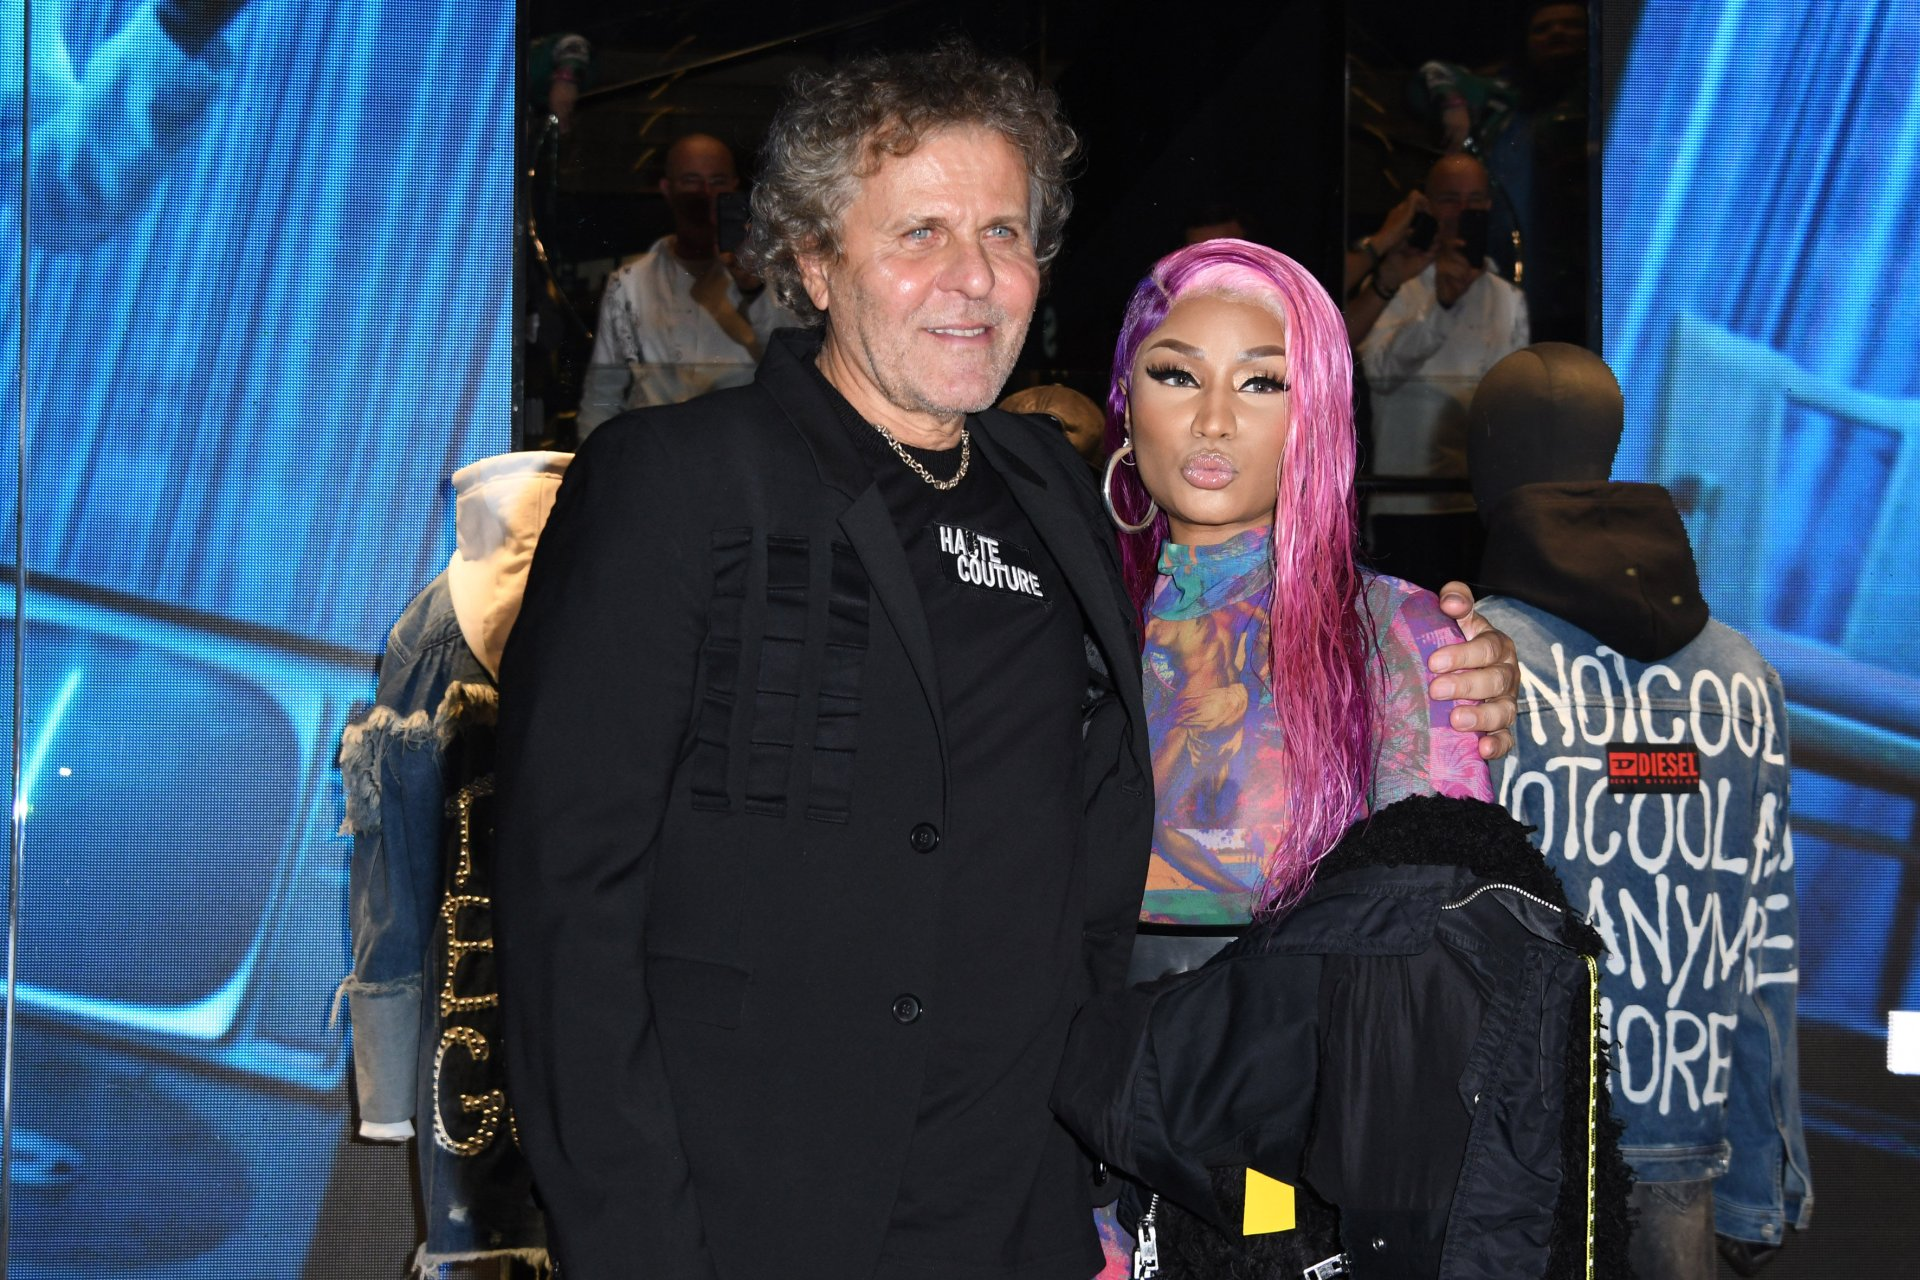 Nicki-Minaj-See-Through-TheFappeningBlog.com-43.jpg